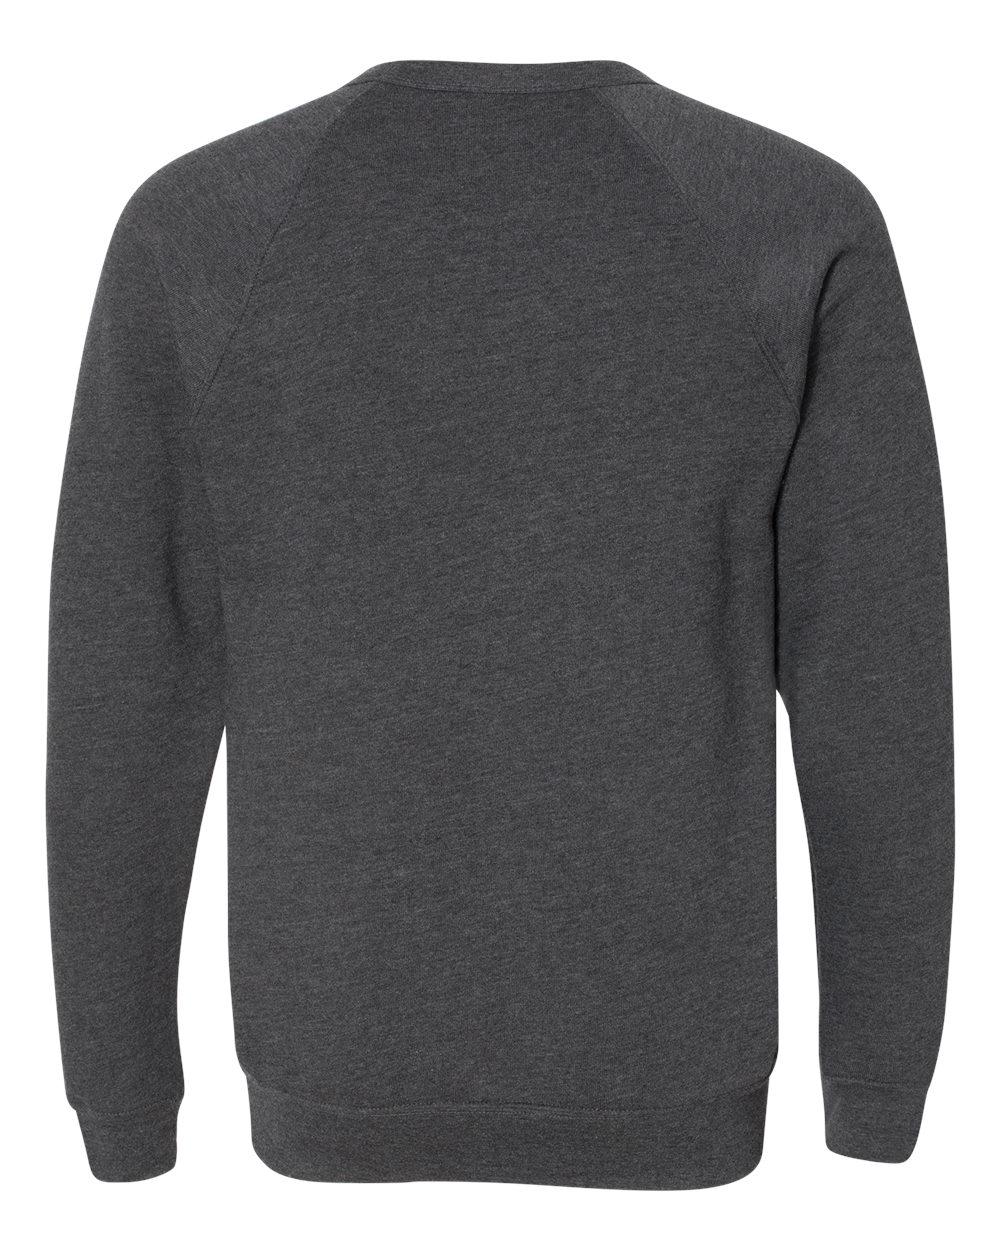 Bella-Canvas-Unisex-Sponge-Fleece-Crewneck-Sweatshirt-Top-Blank-3901-up-to-2XL thumbnail 22